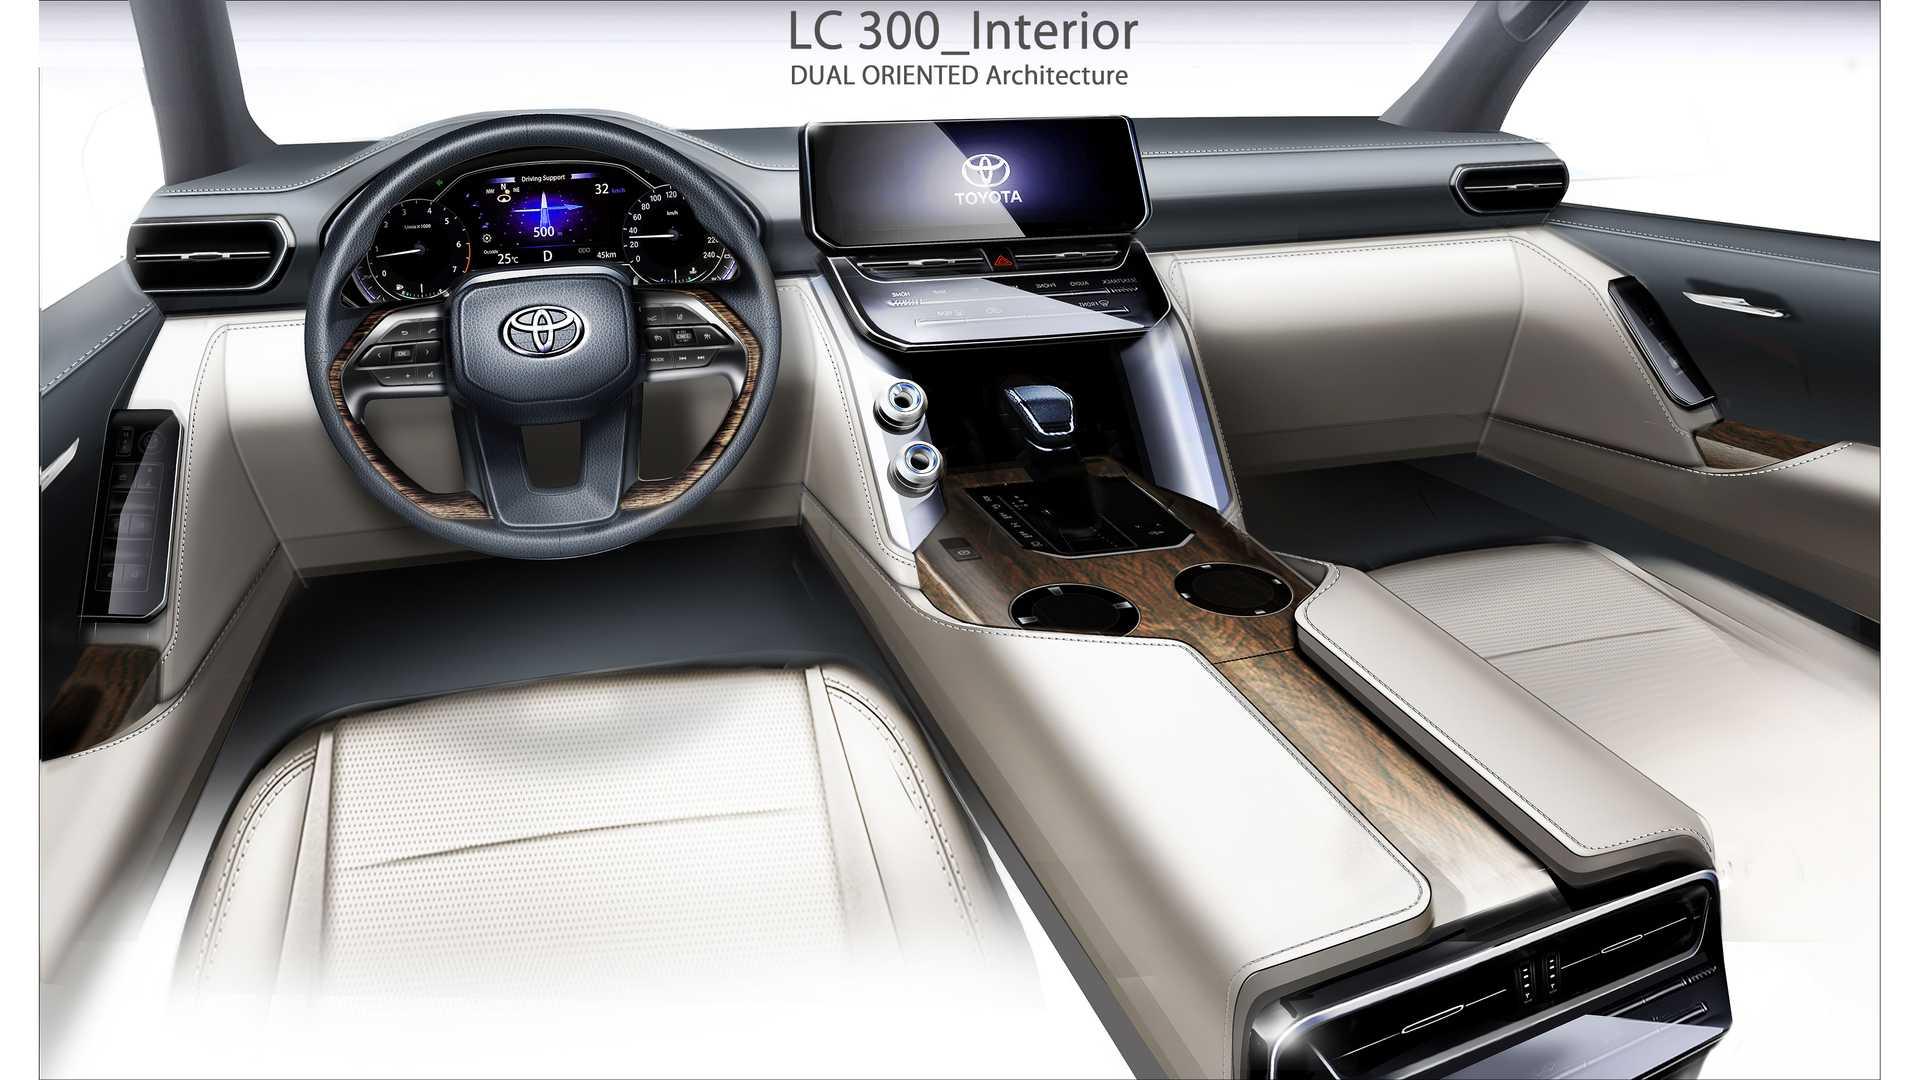 Toyota-Land-Cruiser-design-sketches-22